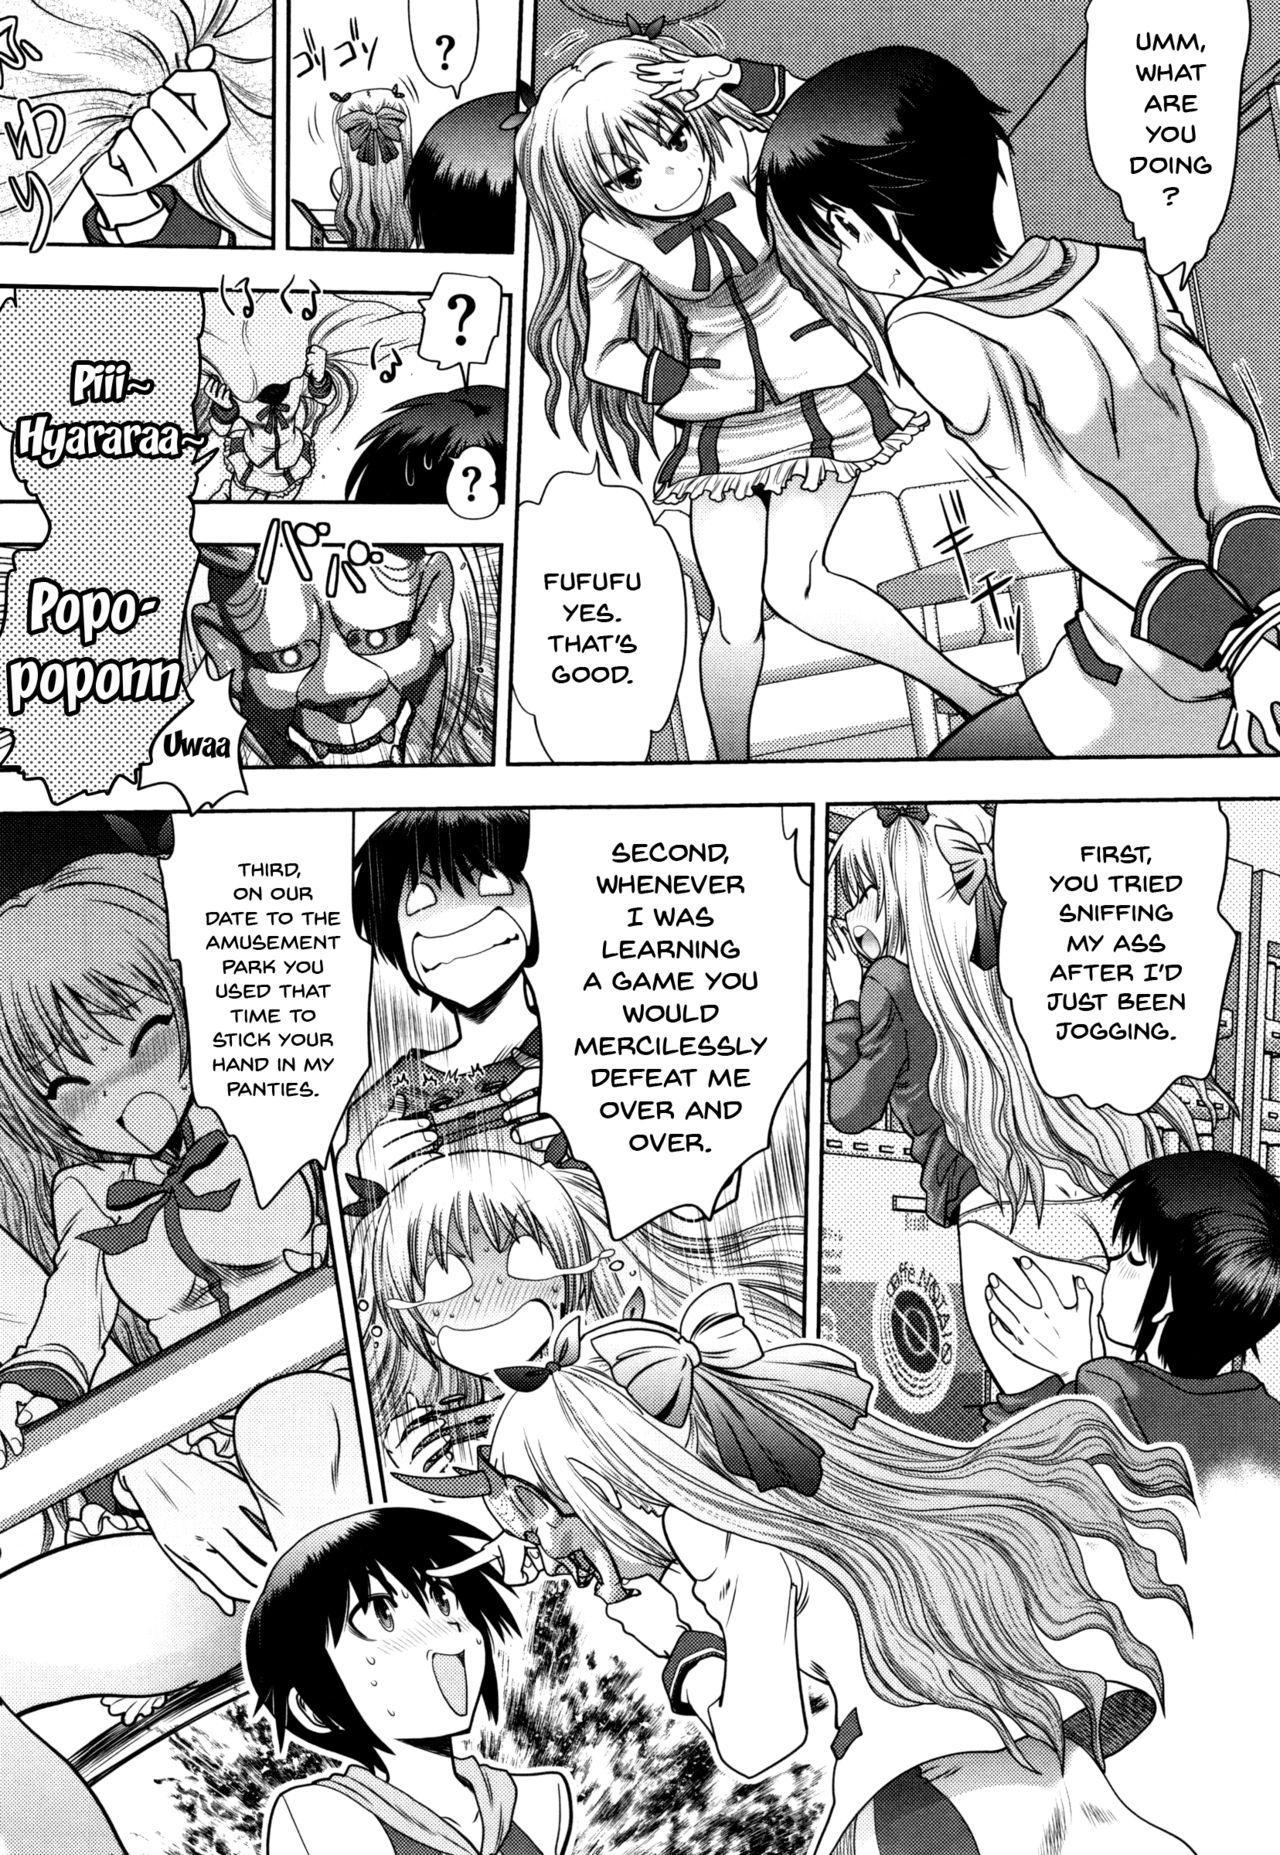 [Yagami Dai] Maji de Watashi ni Koi Shinasai! S Adult Edition ~Shodai Heroine Hen~ | Fall in Love With Me For Real! Ch.1-8 [English] {Doujins.com} 128